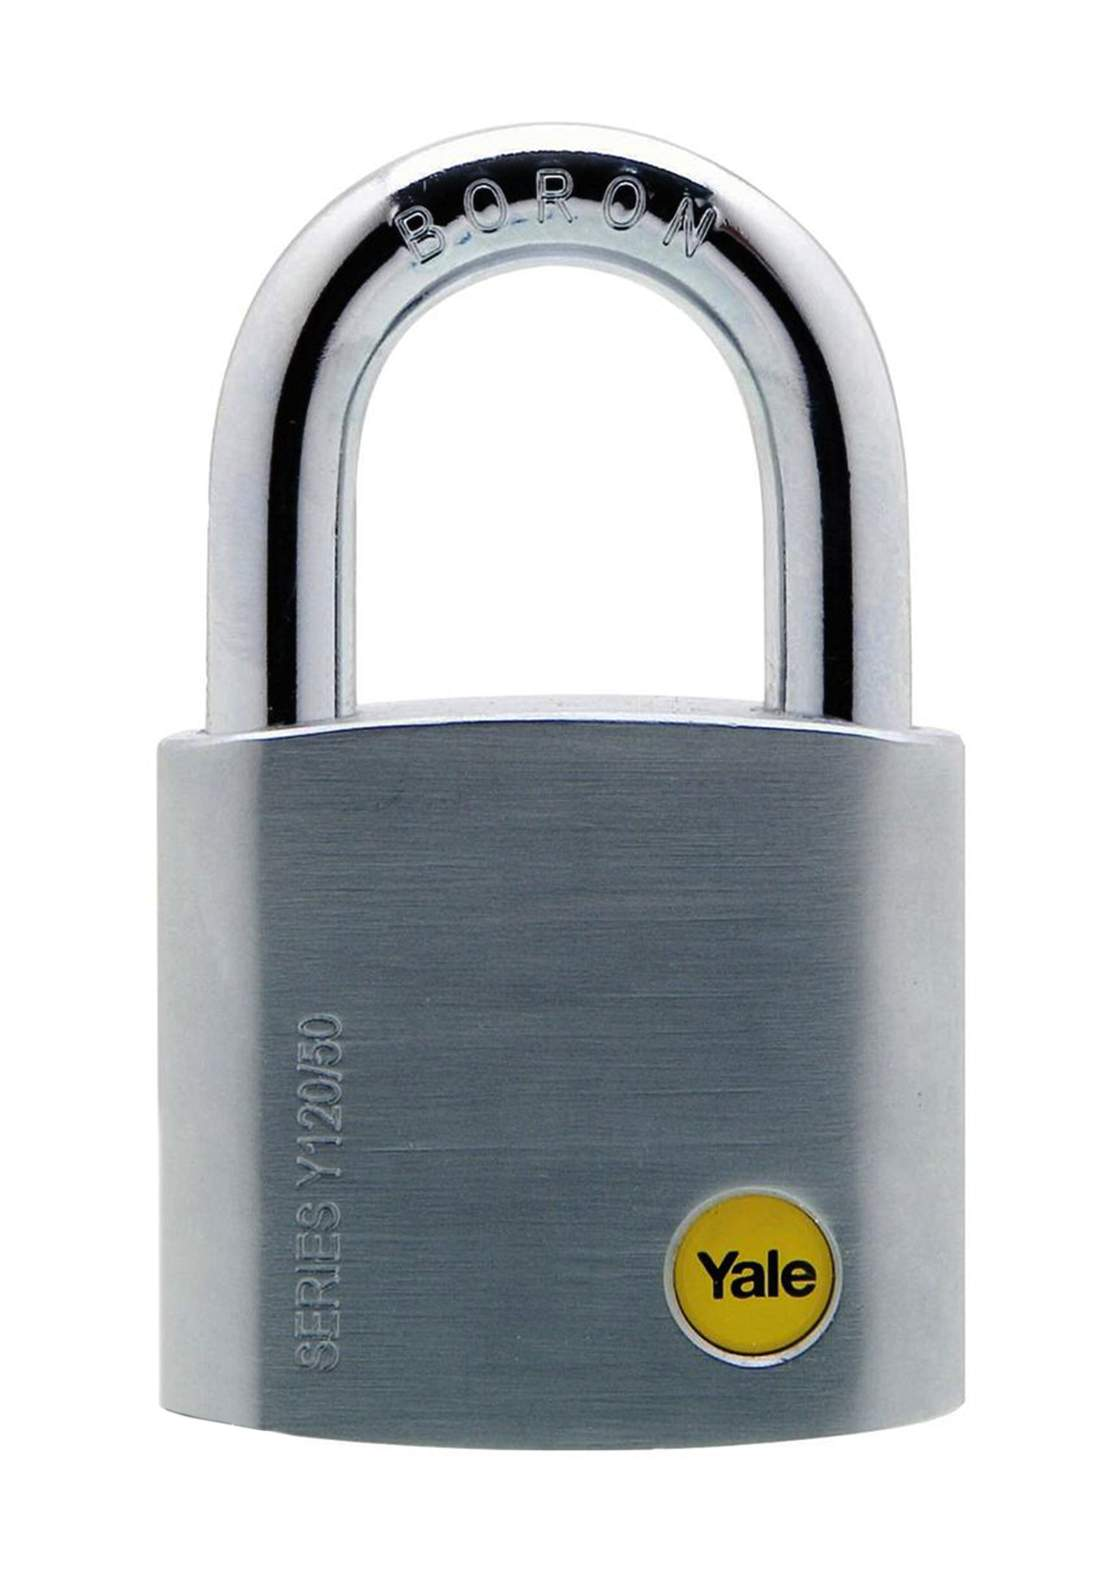 Yale Y120B/70/141/1 Padlock Brass 70 mm قفل للاغراض العامة